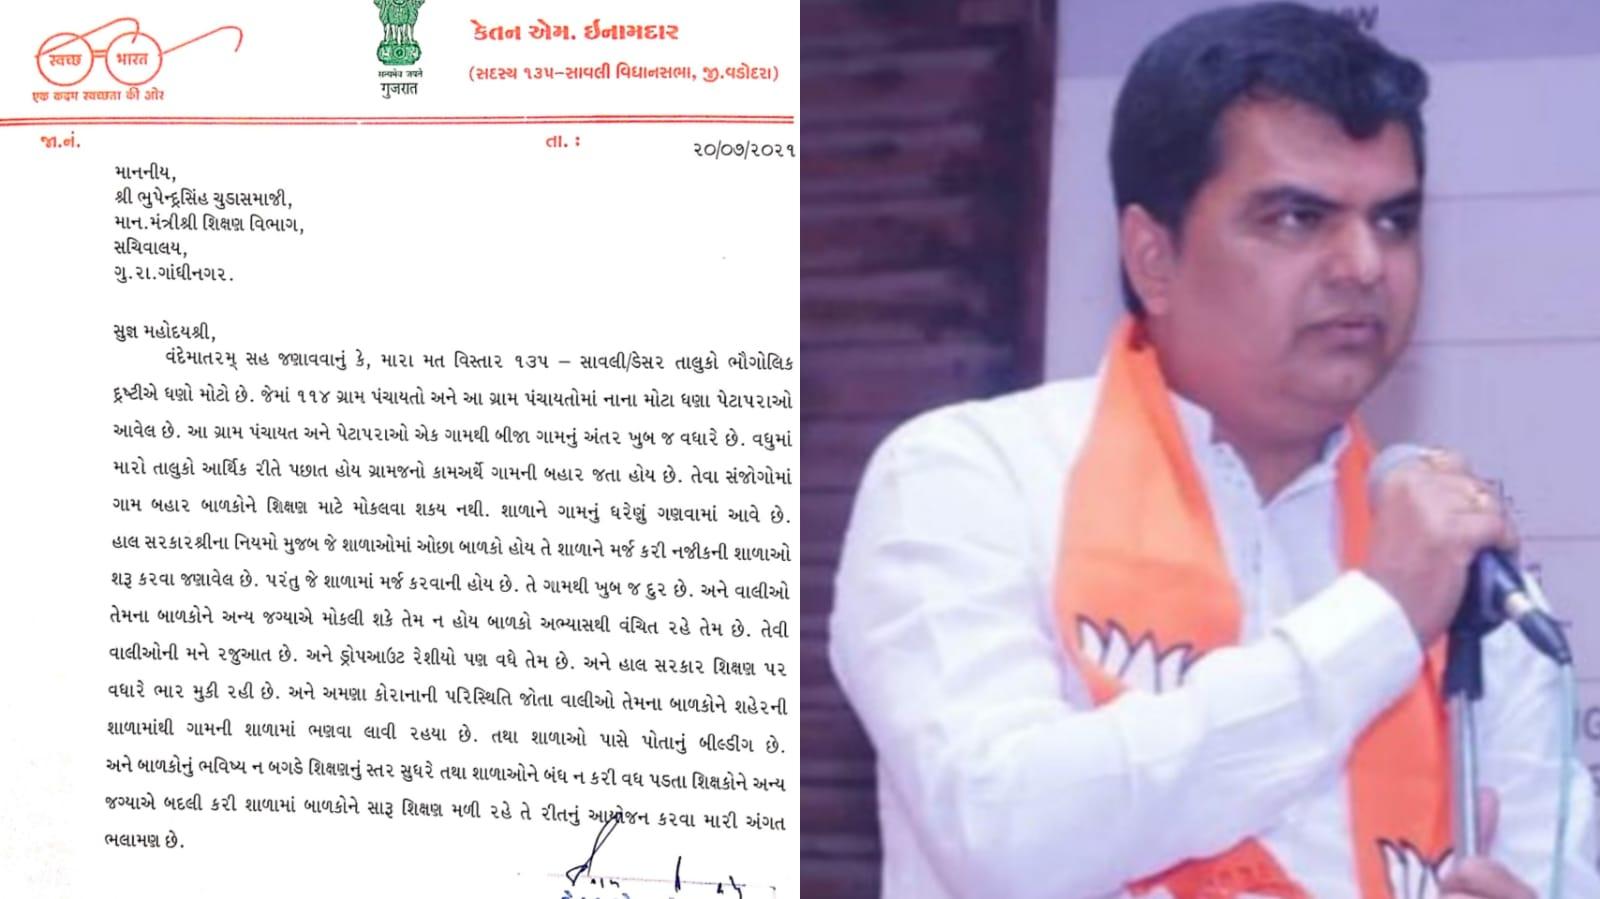 Gujarat BJP MLA Ketan Inamdar Wrote Letter to Education Minister